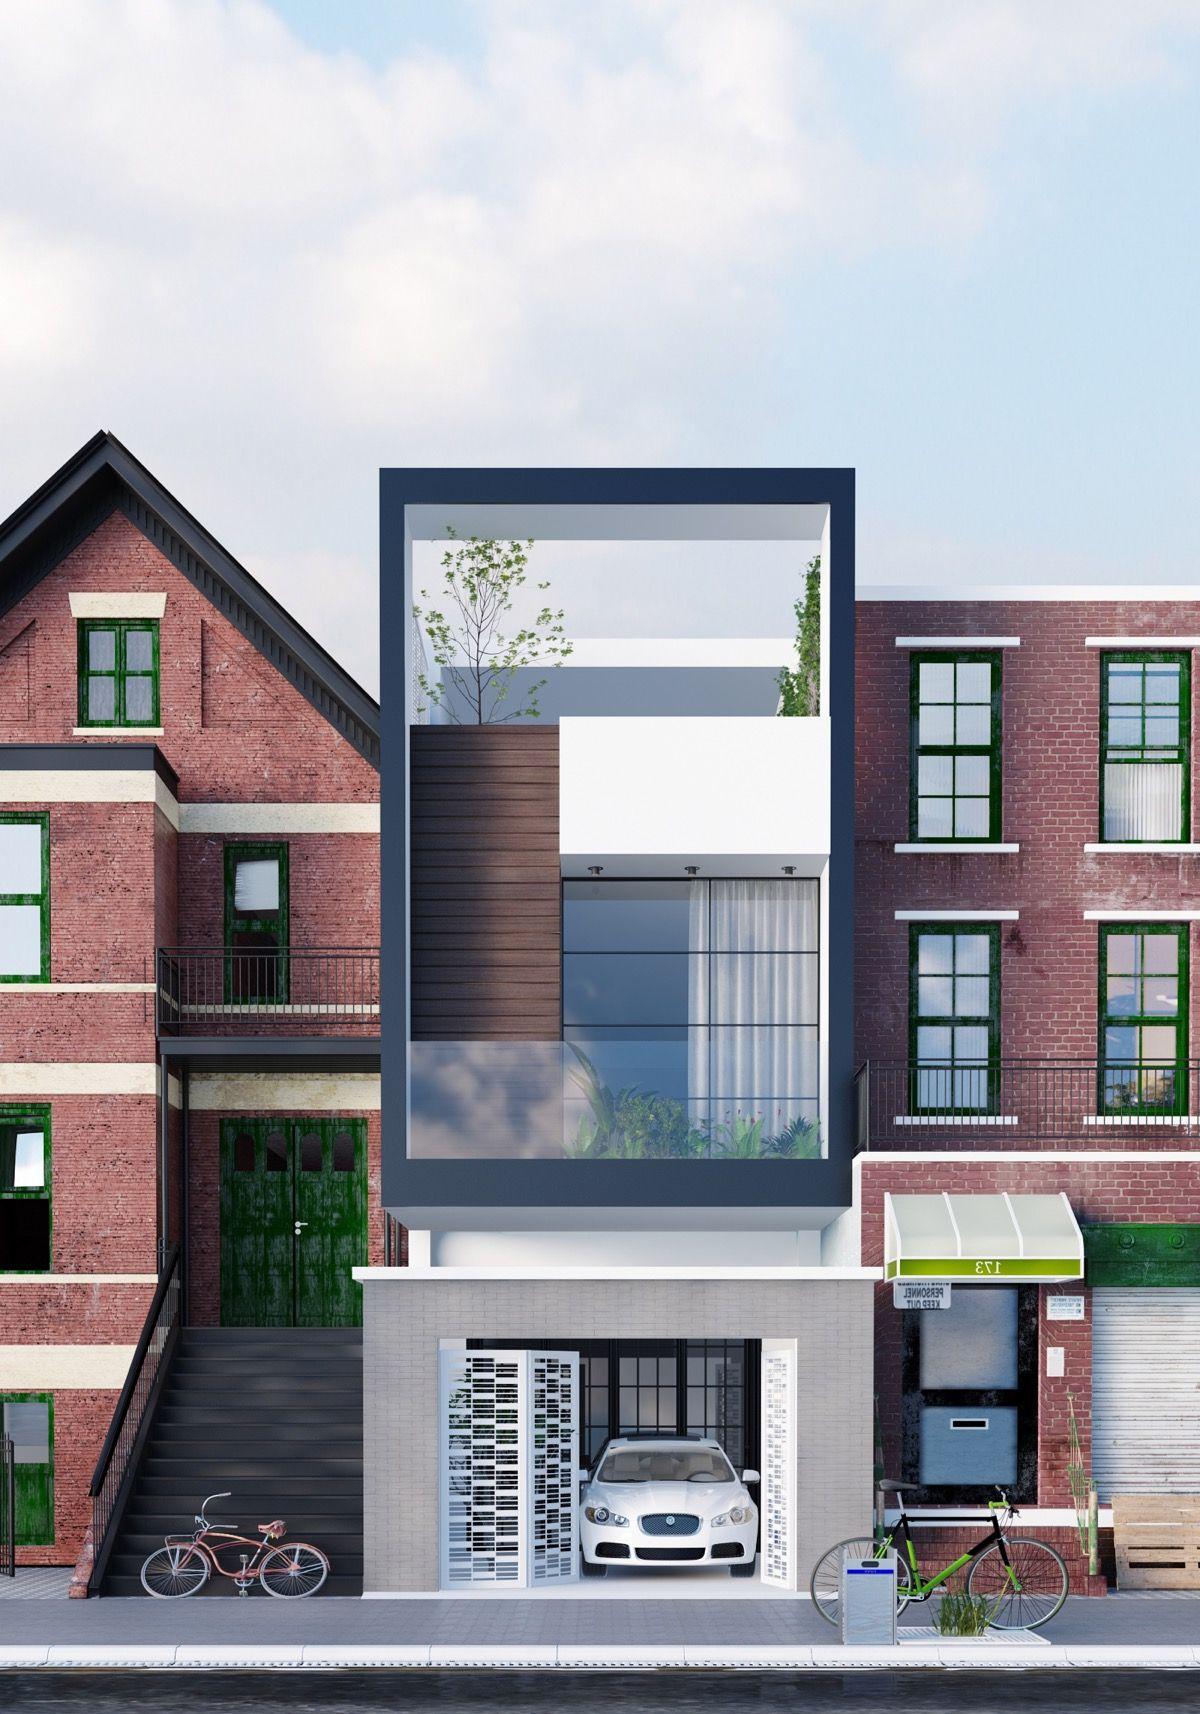 49 Most Popular Modern Dream House Exterior Design Ideas 3: 50 Narrow Lot Houses That Transform A Skinny Exterior Into Something Special